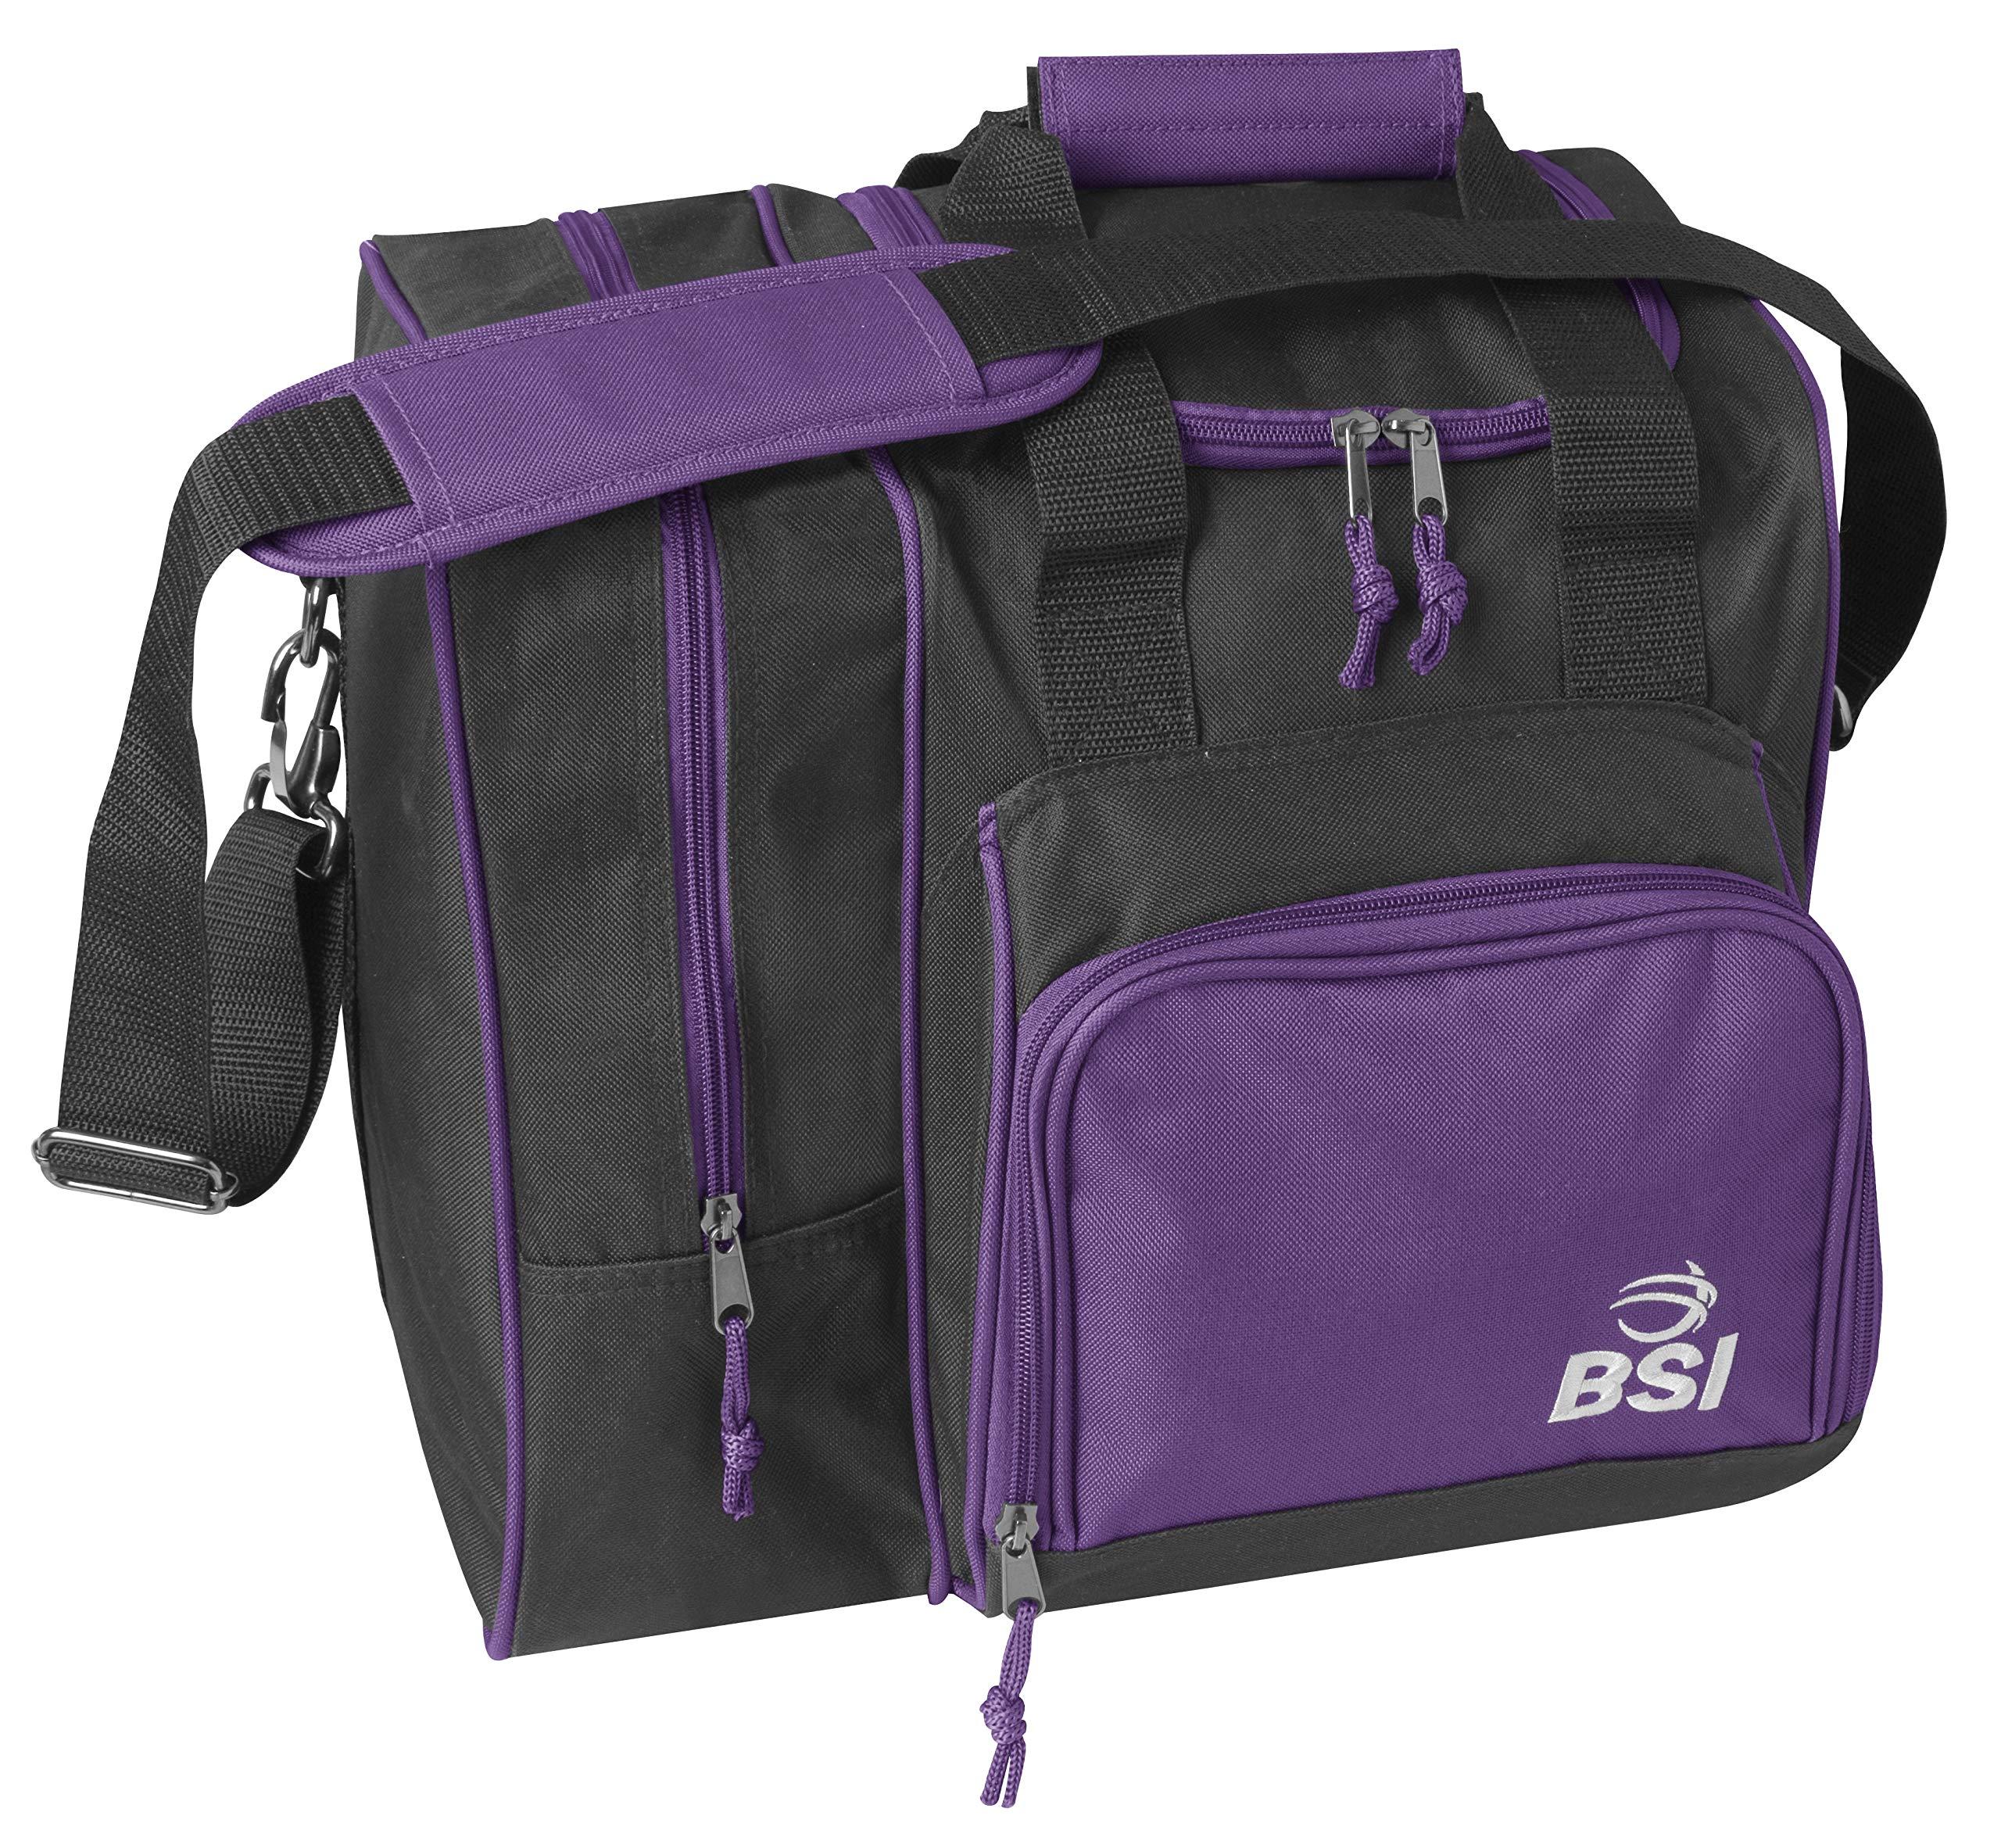 BSI 422 Bowling Bags, Black/Purple